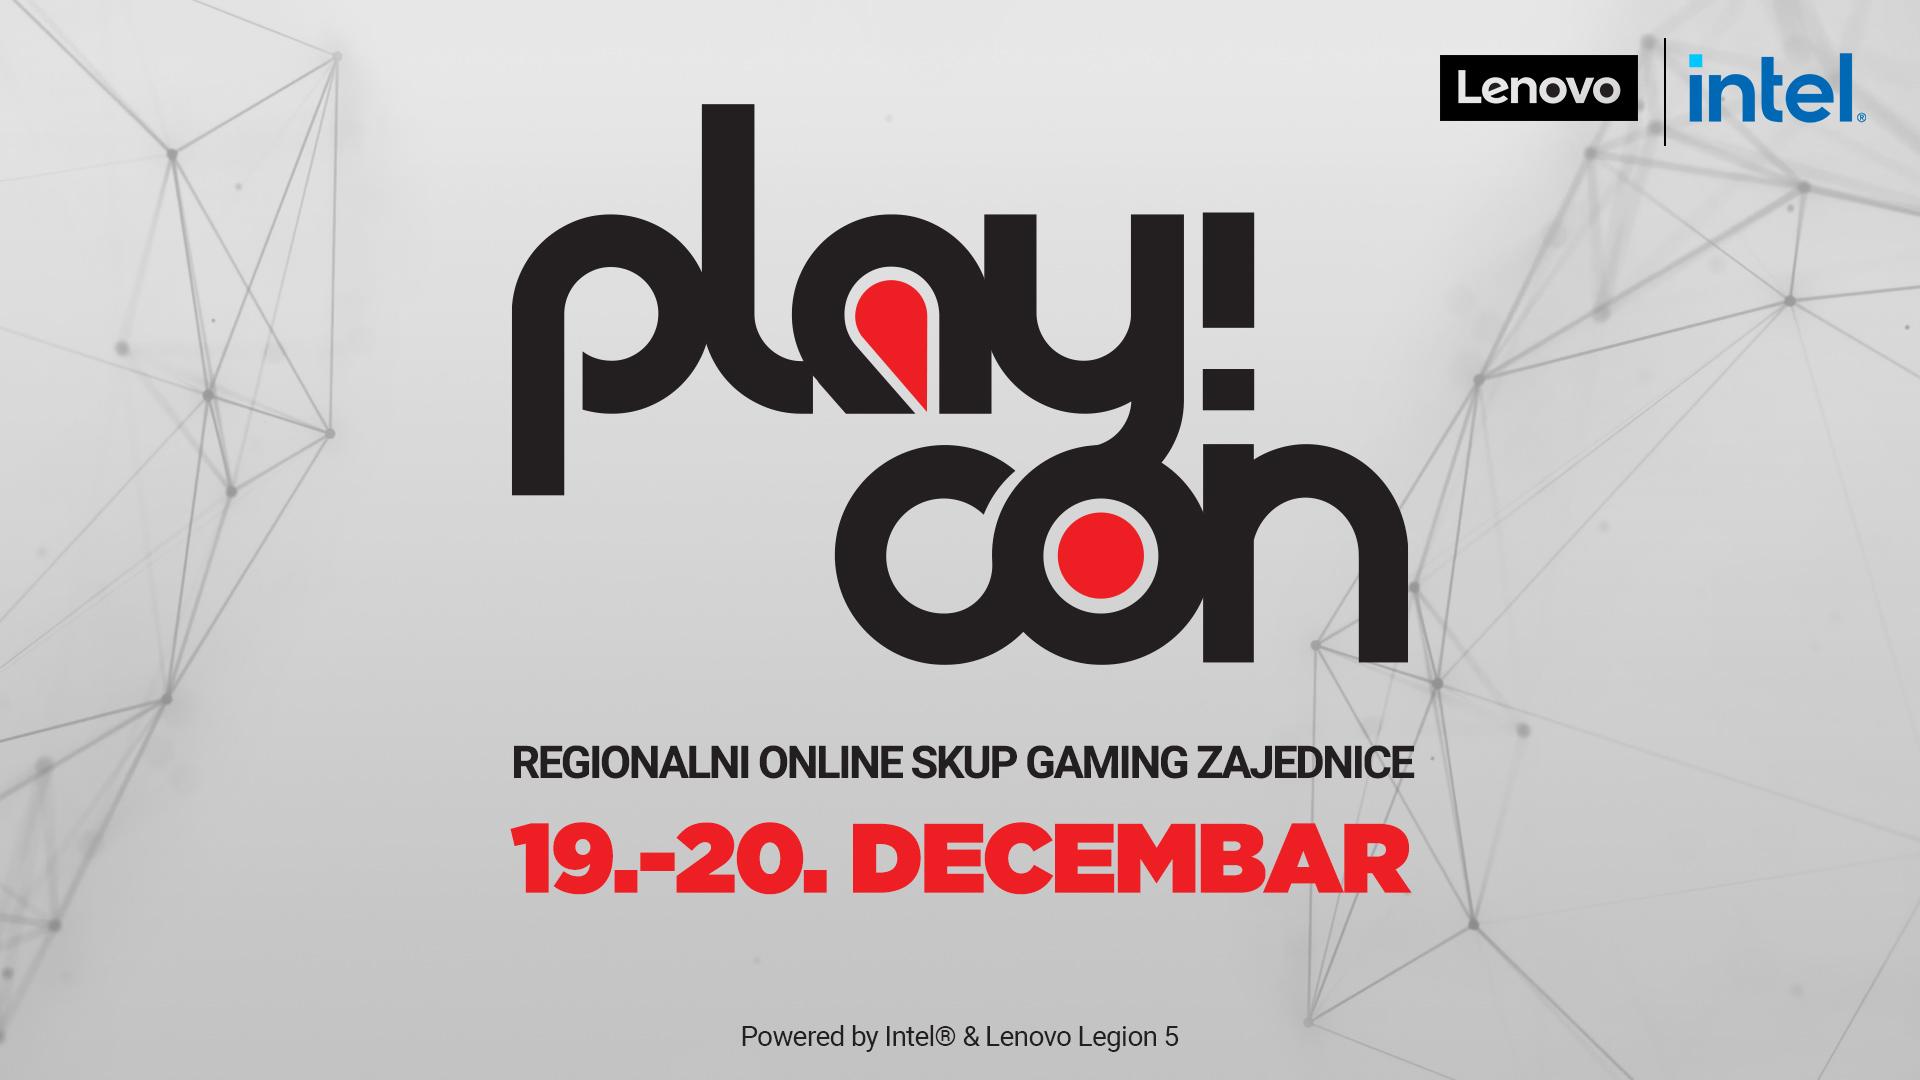 PlayCon-1